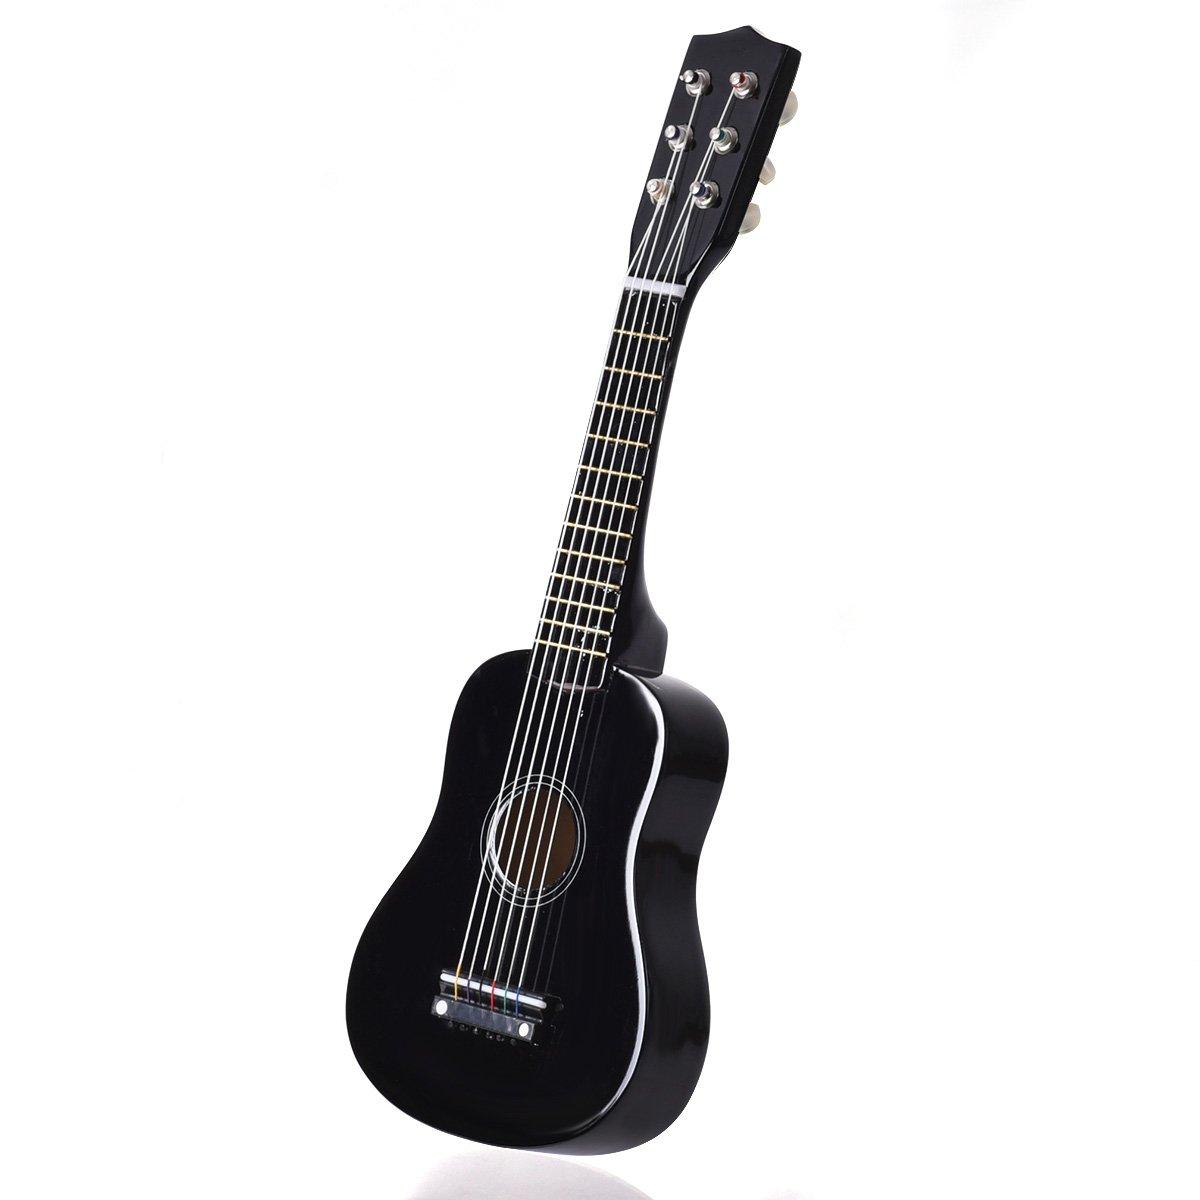 Goplus 21'' Beginners Kids Acoustic Guitar 6 String with Pick Children Kids Musical Gift (Black)